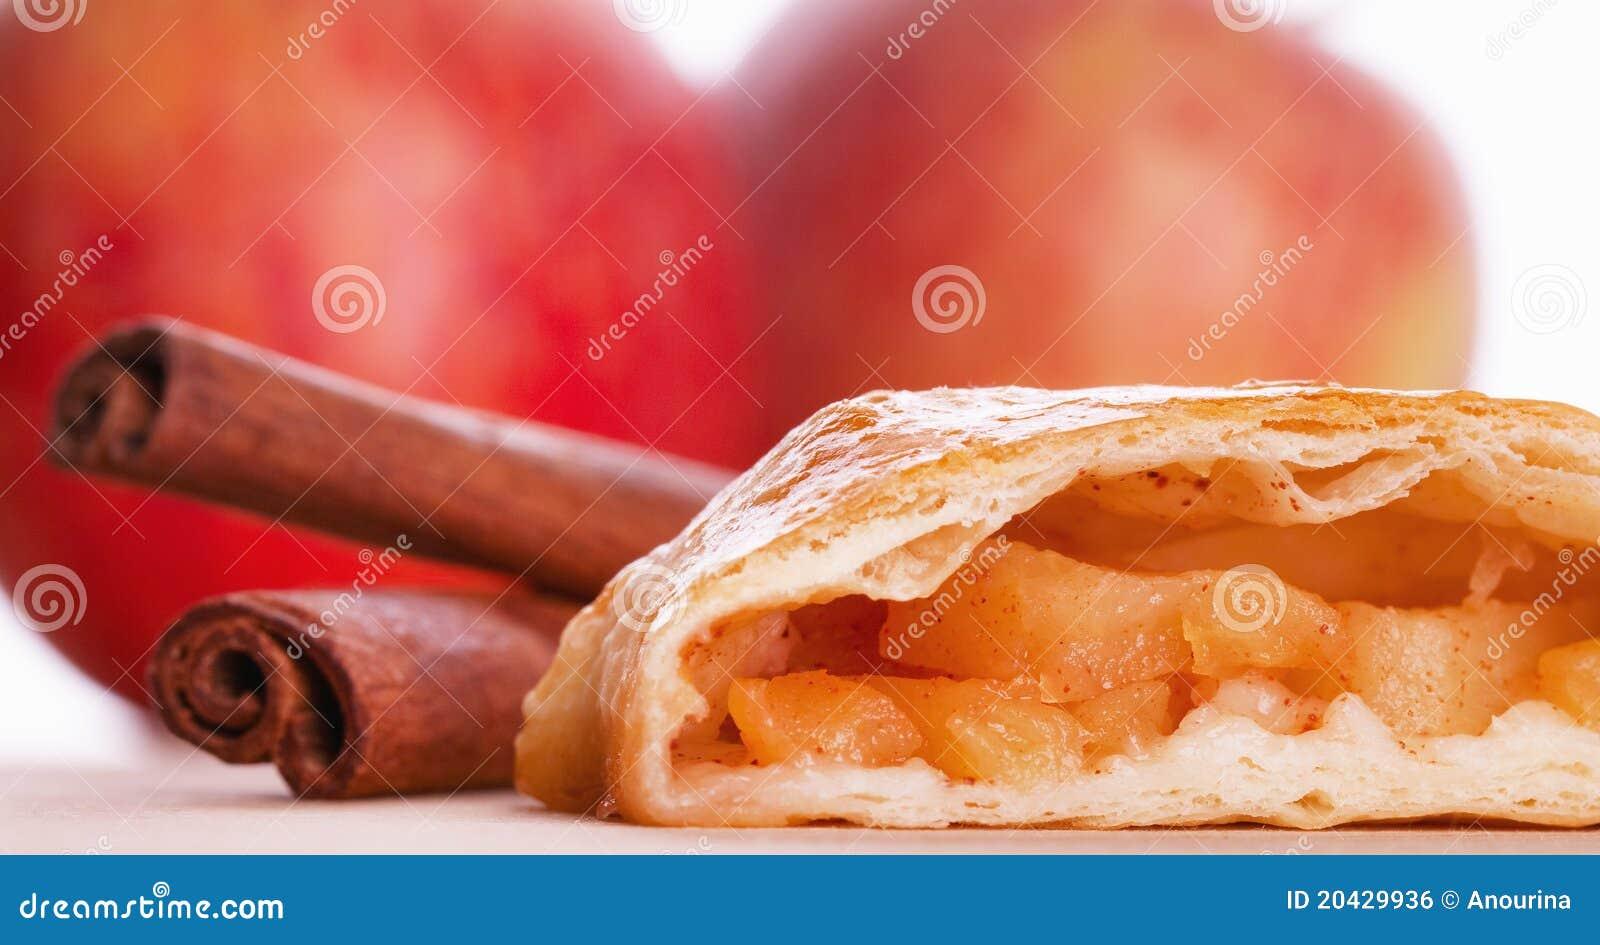 Apple Strudel And Cinnamon Royalty Free Stock Image ...